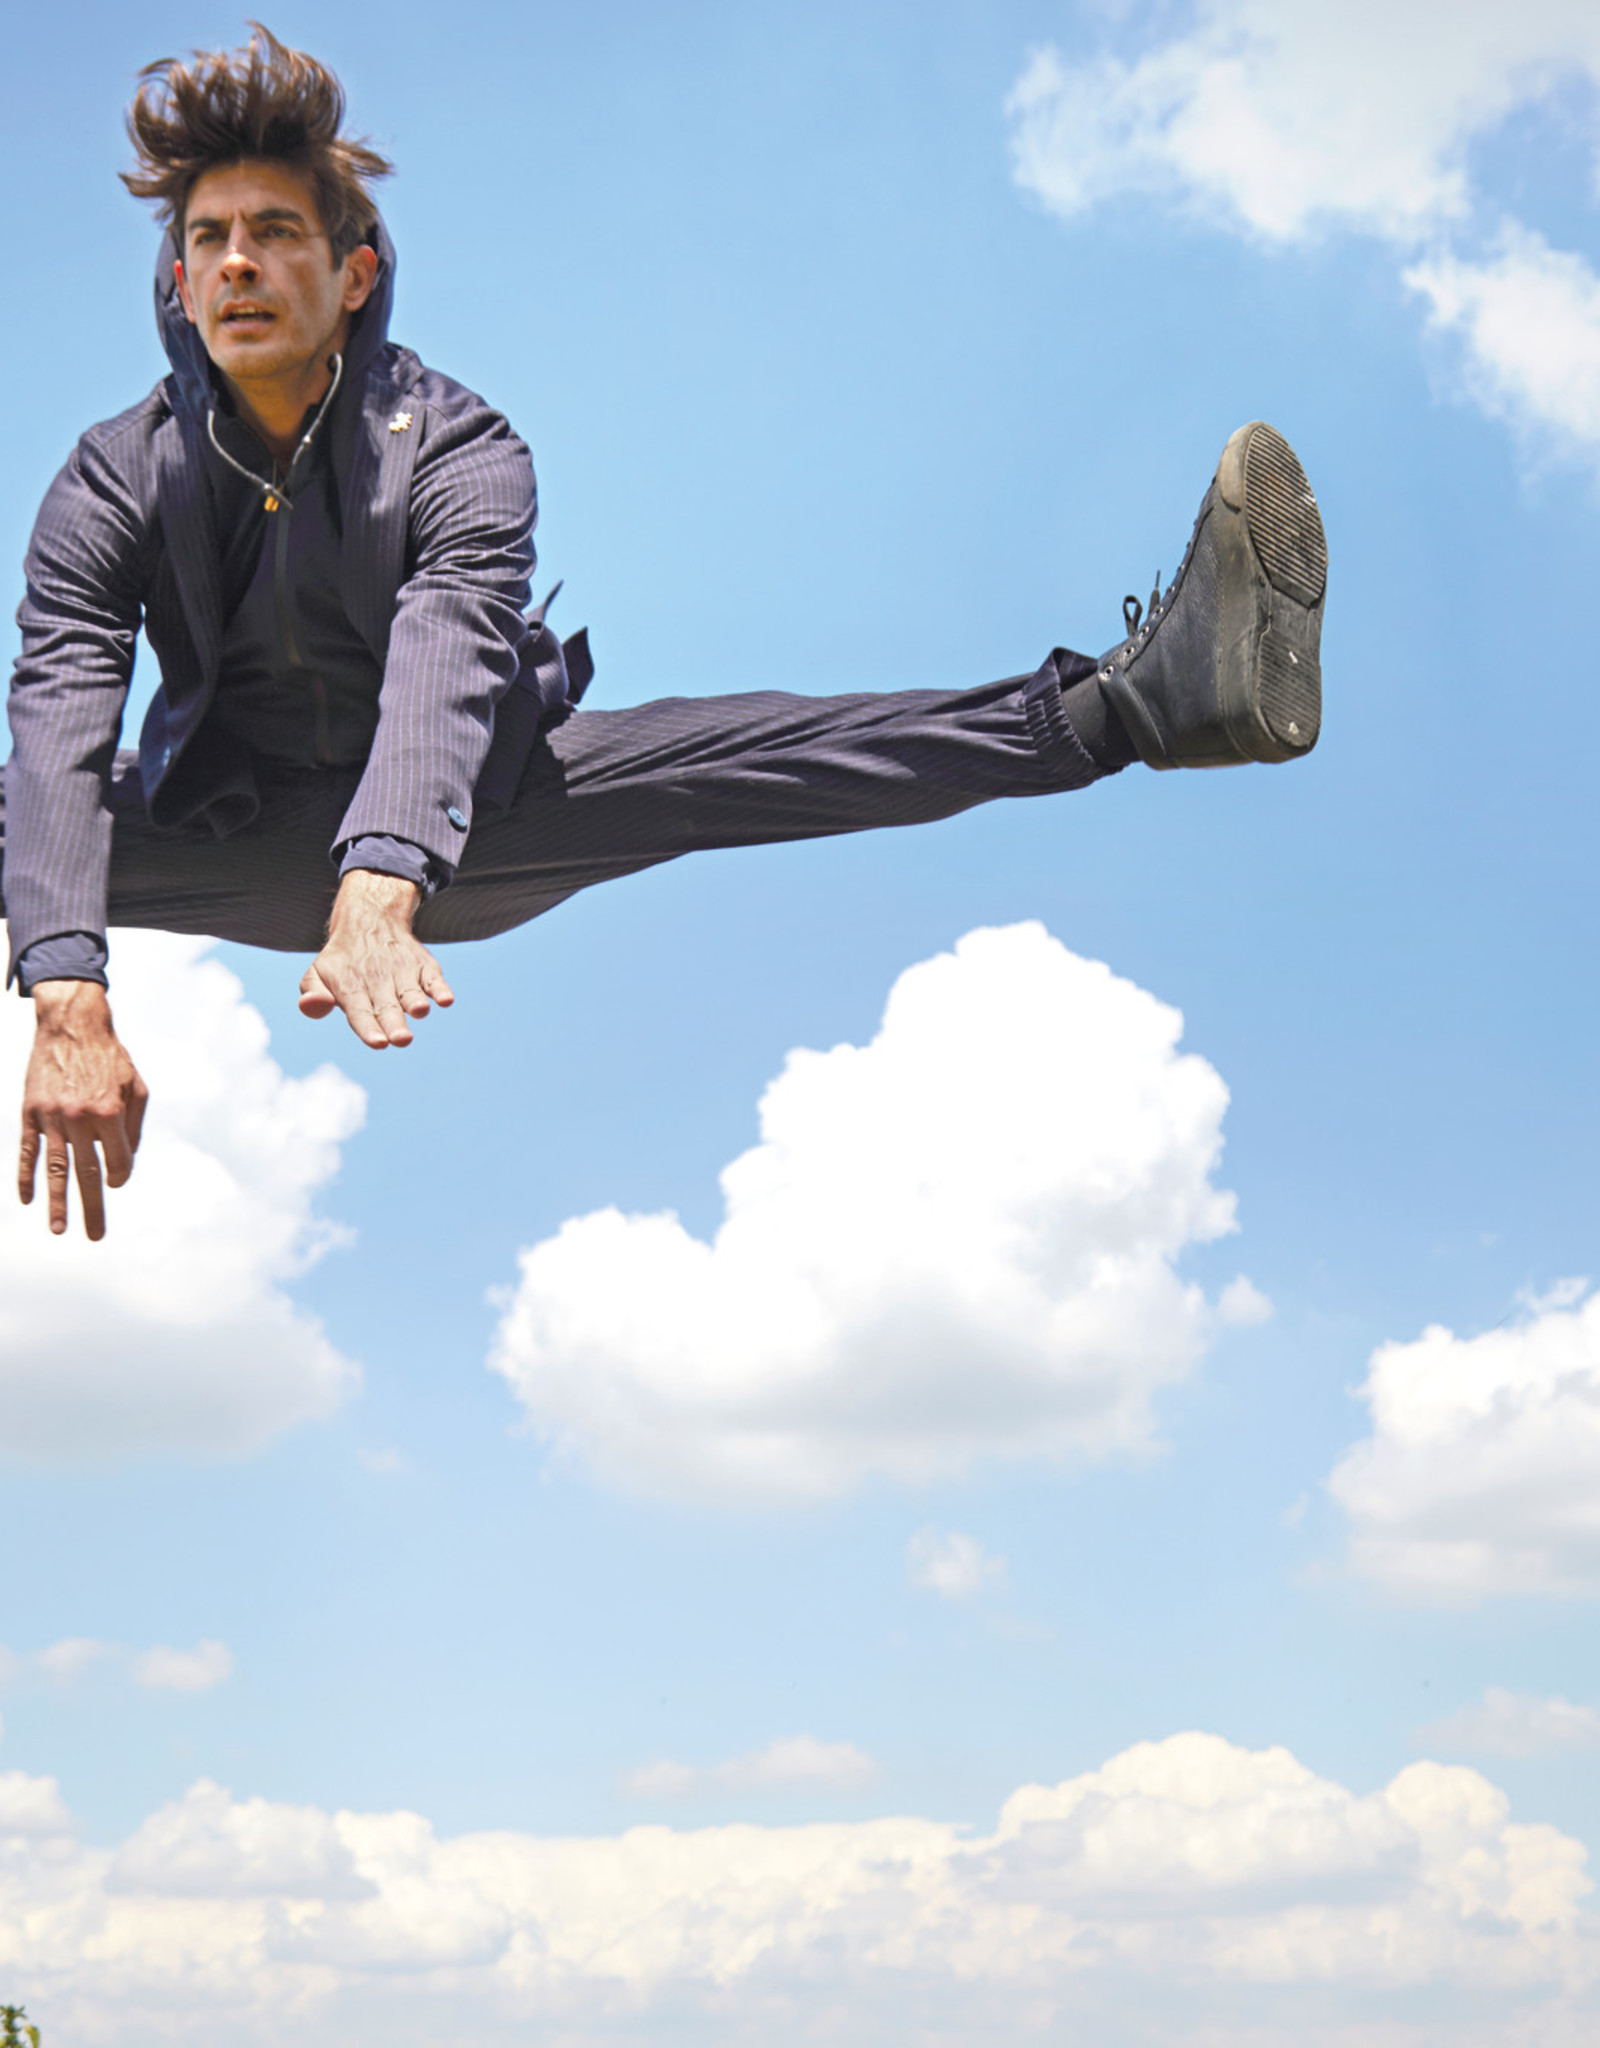 Tombolini Tombolini vest blauw running suit zero gravity EYAP U780